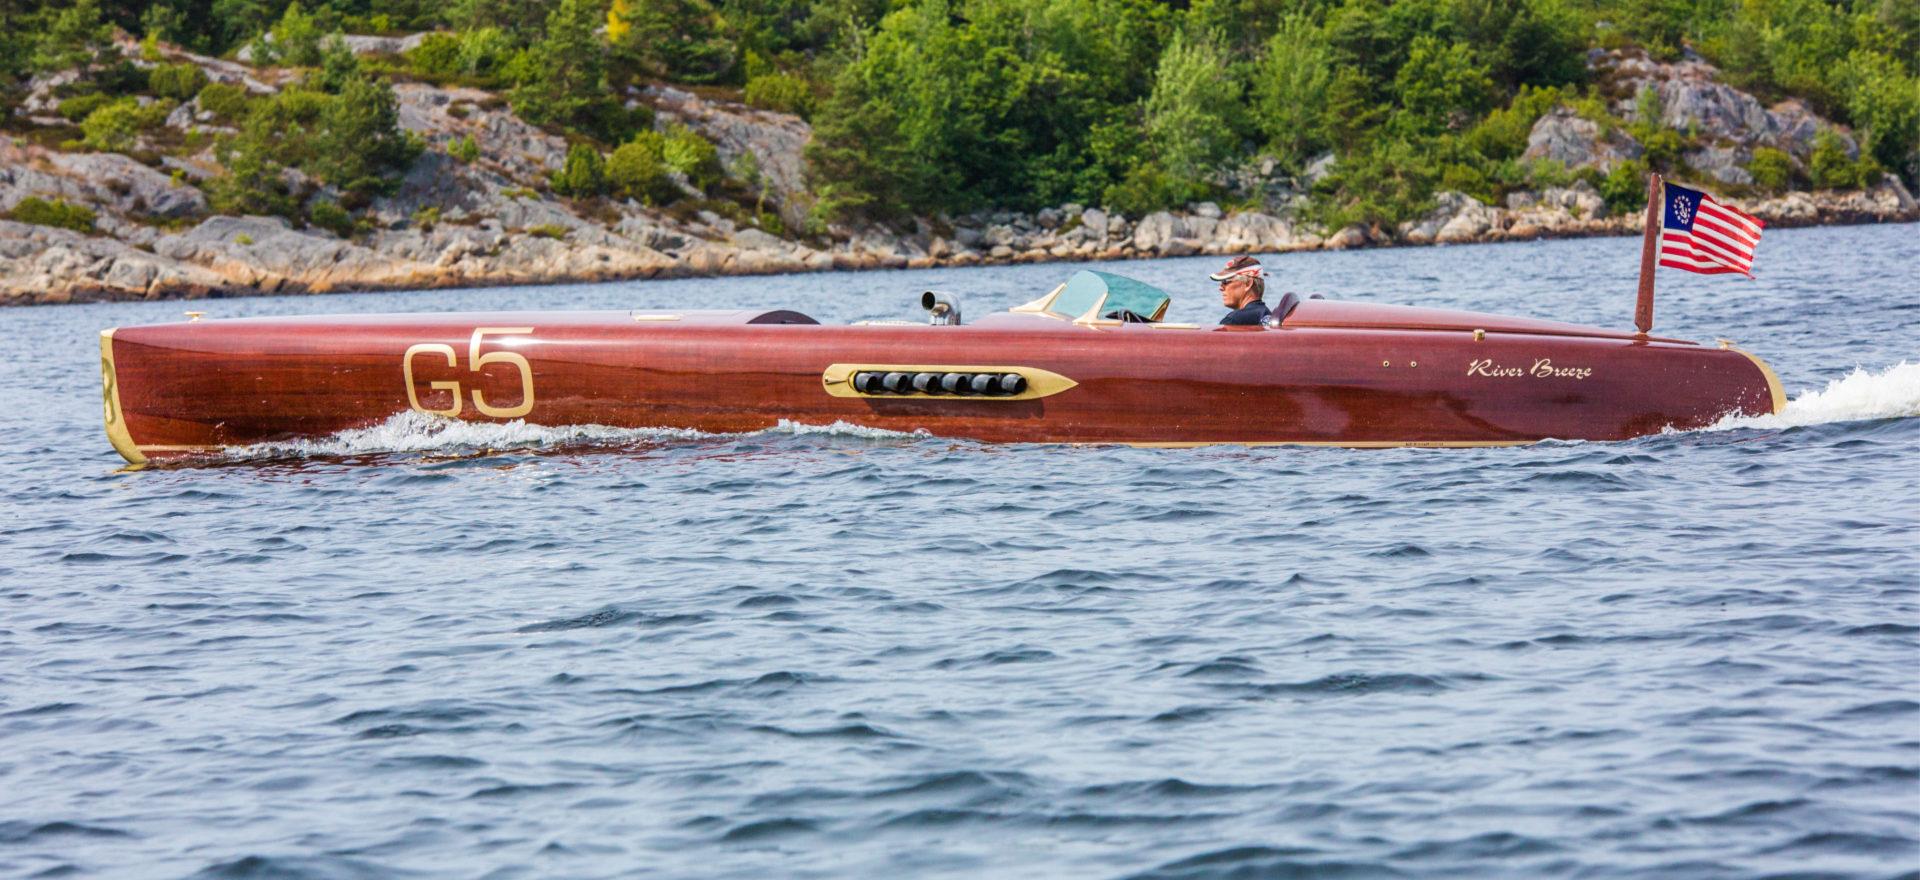 G5 boat_PRINT-7292